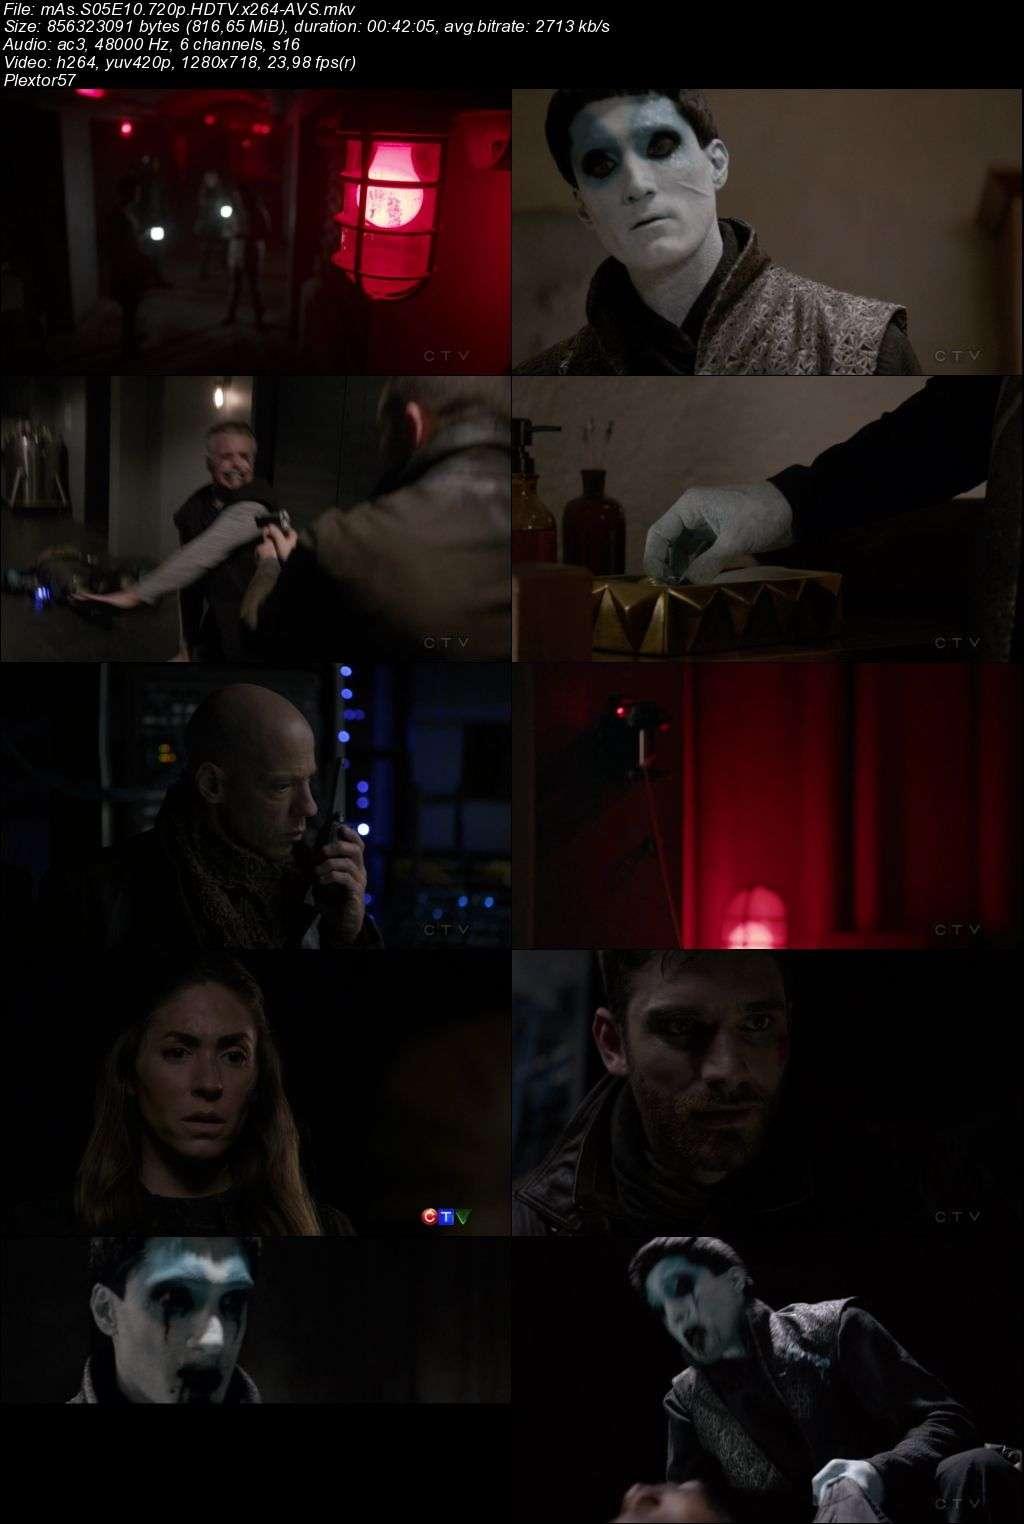 marvels agents of shield 5.sezon tum bolumler